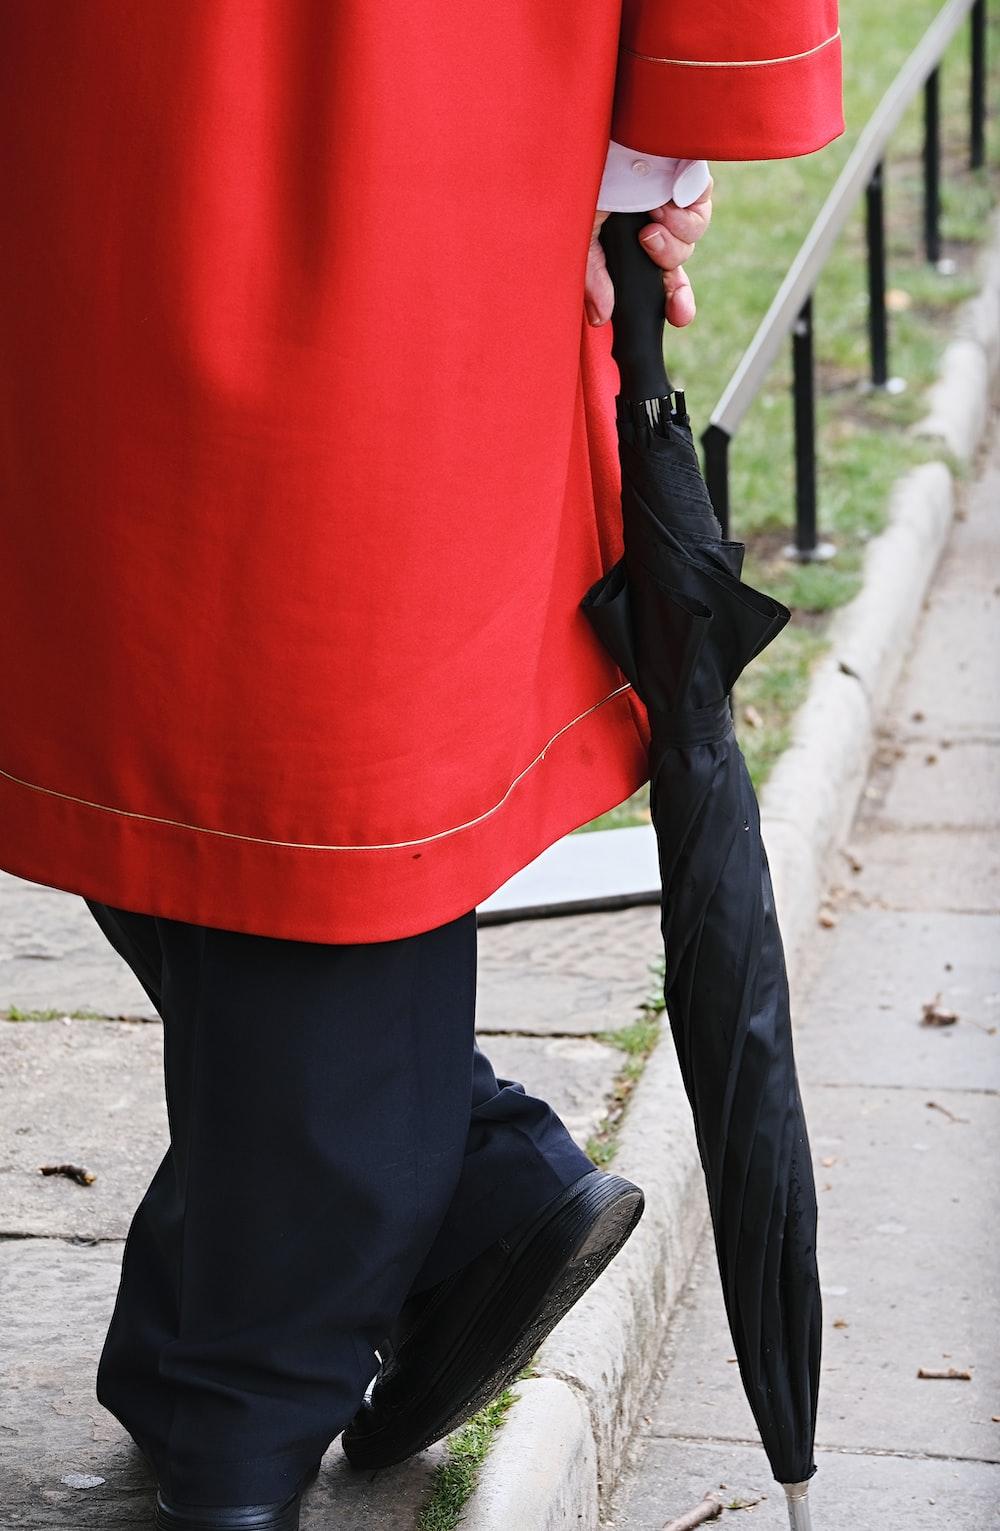 standing person holding black umbrella